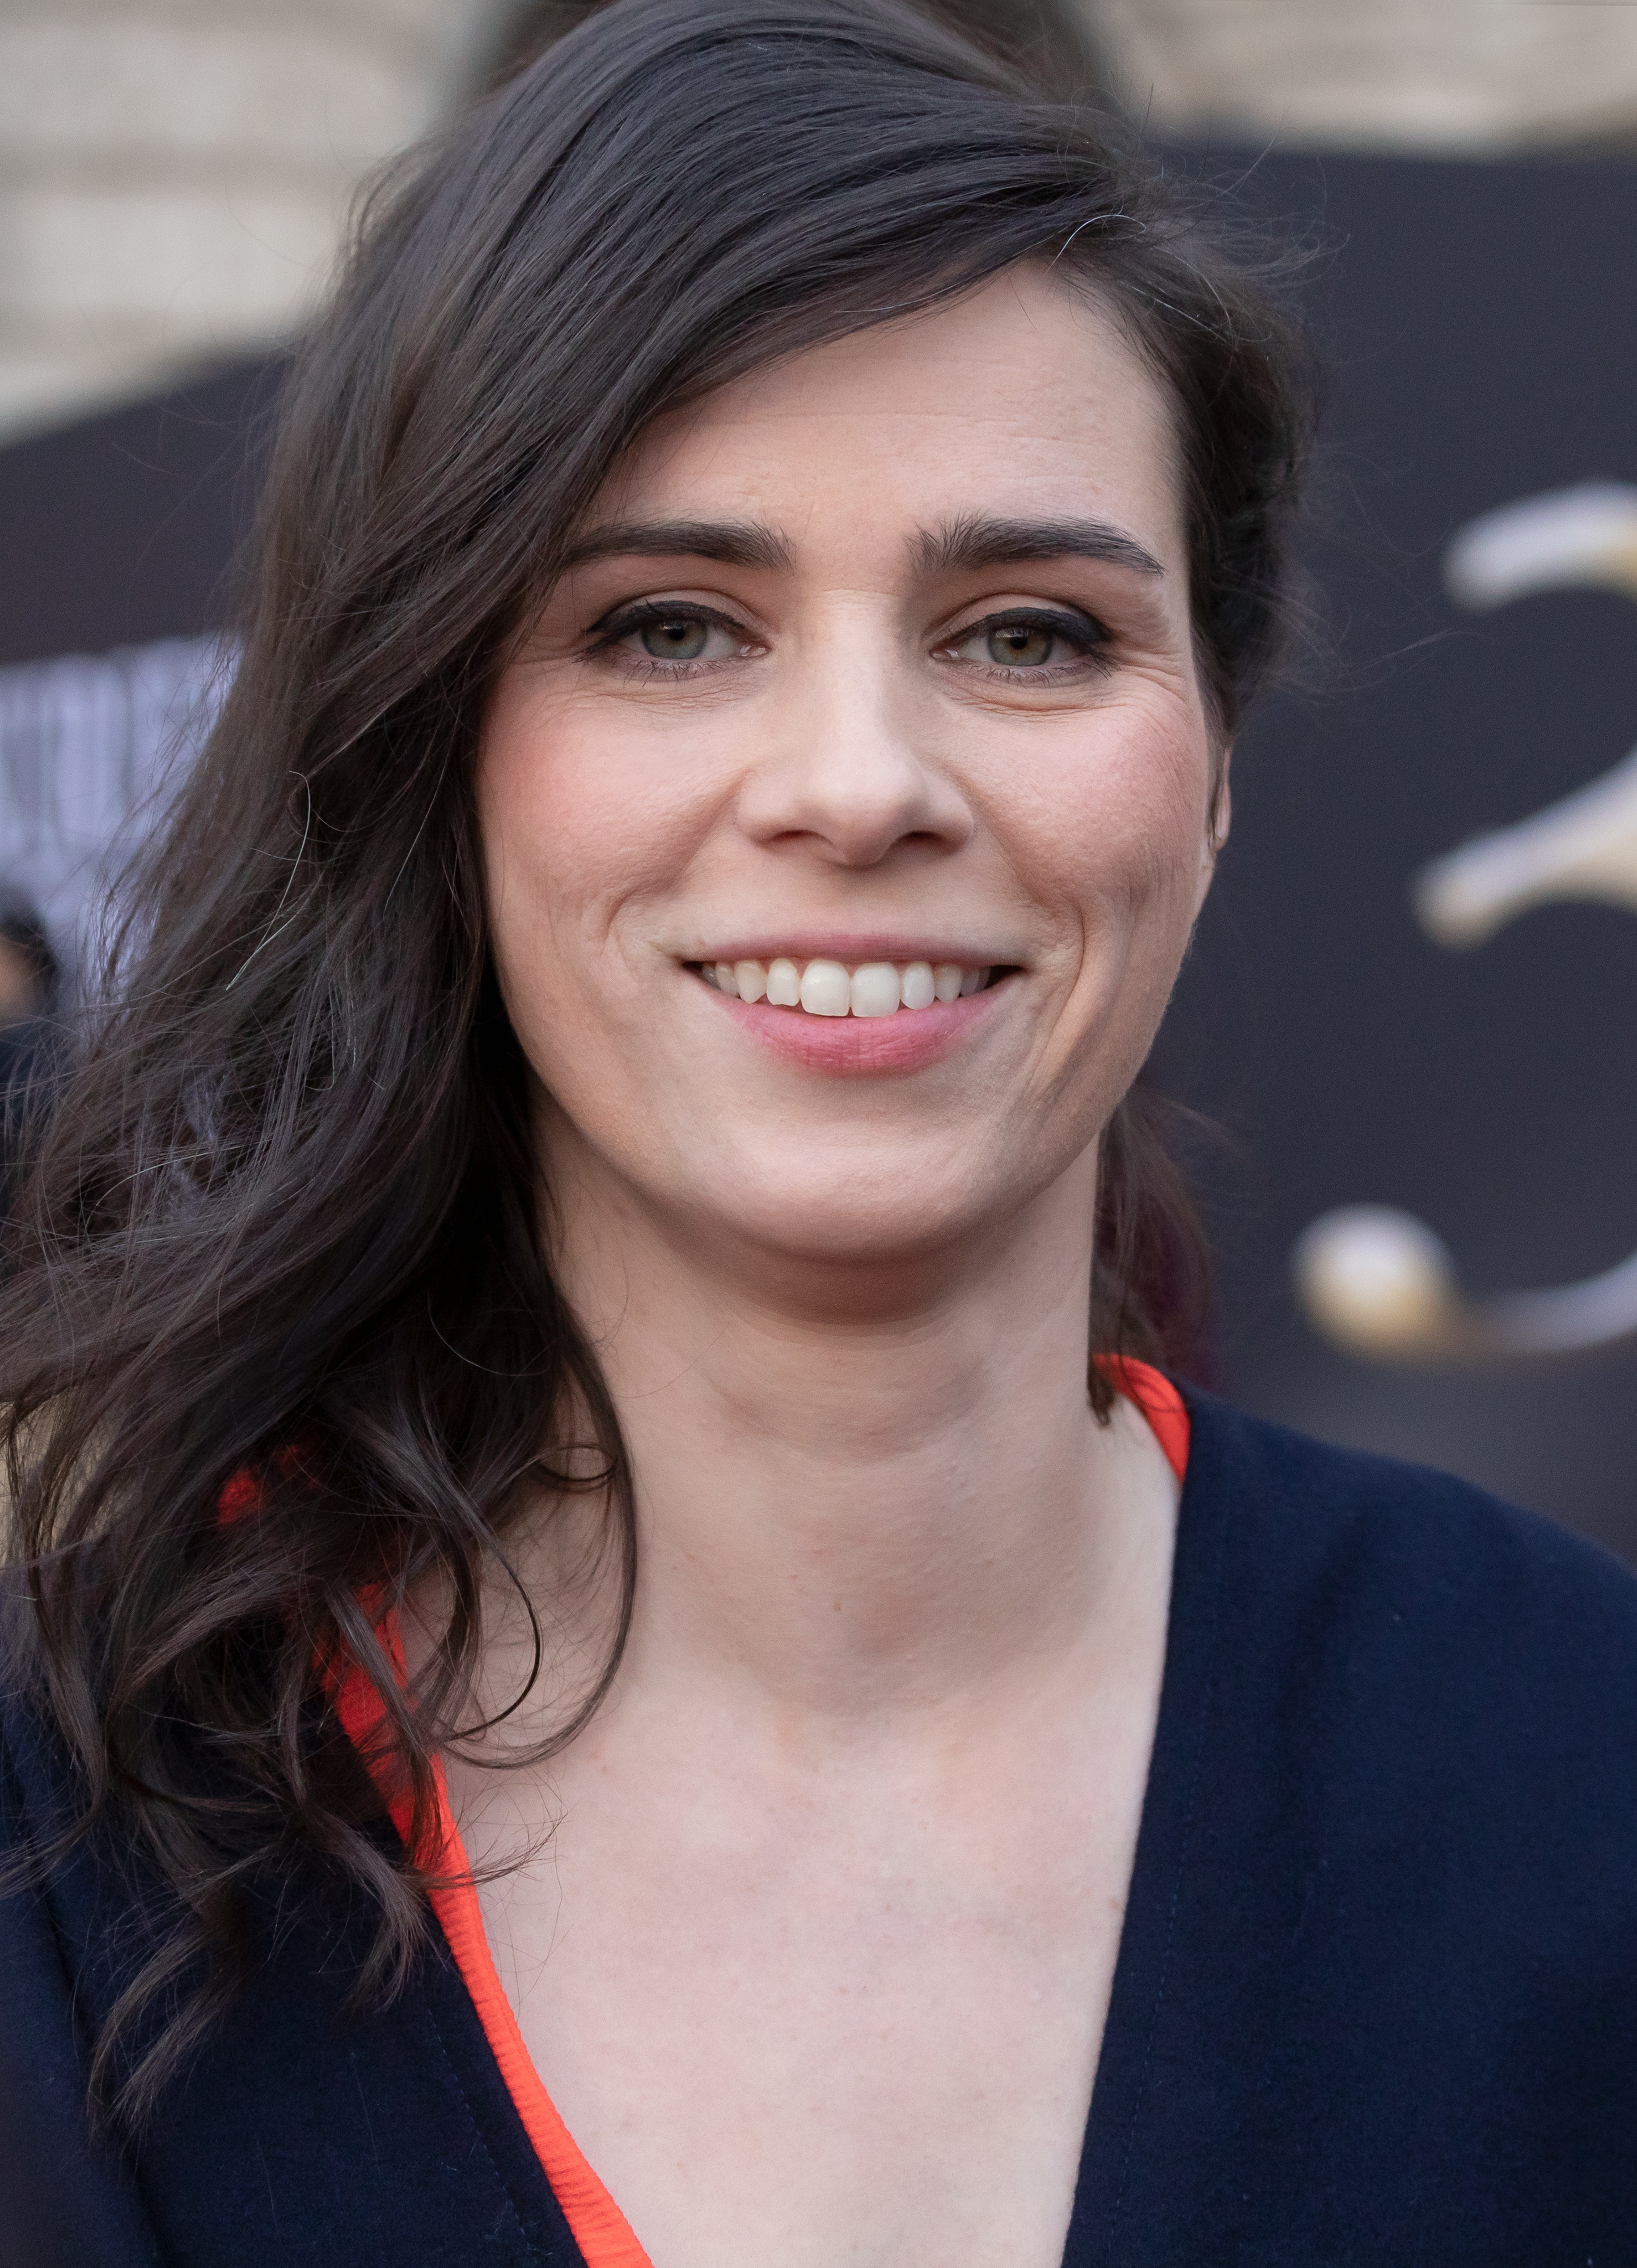 Nora Tschirner Tochter